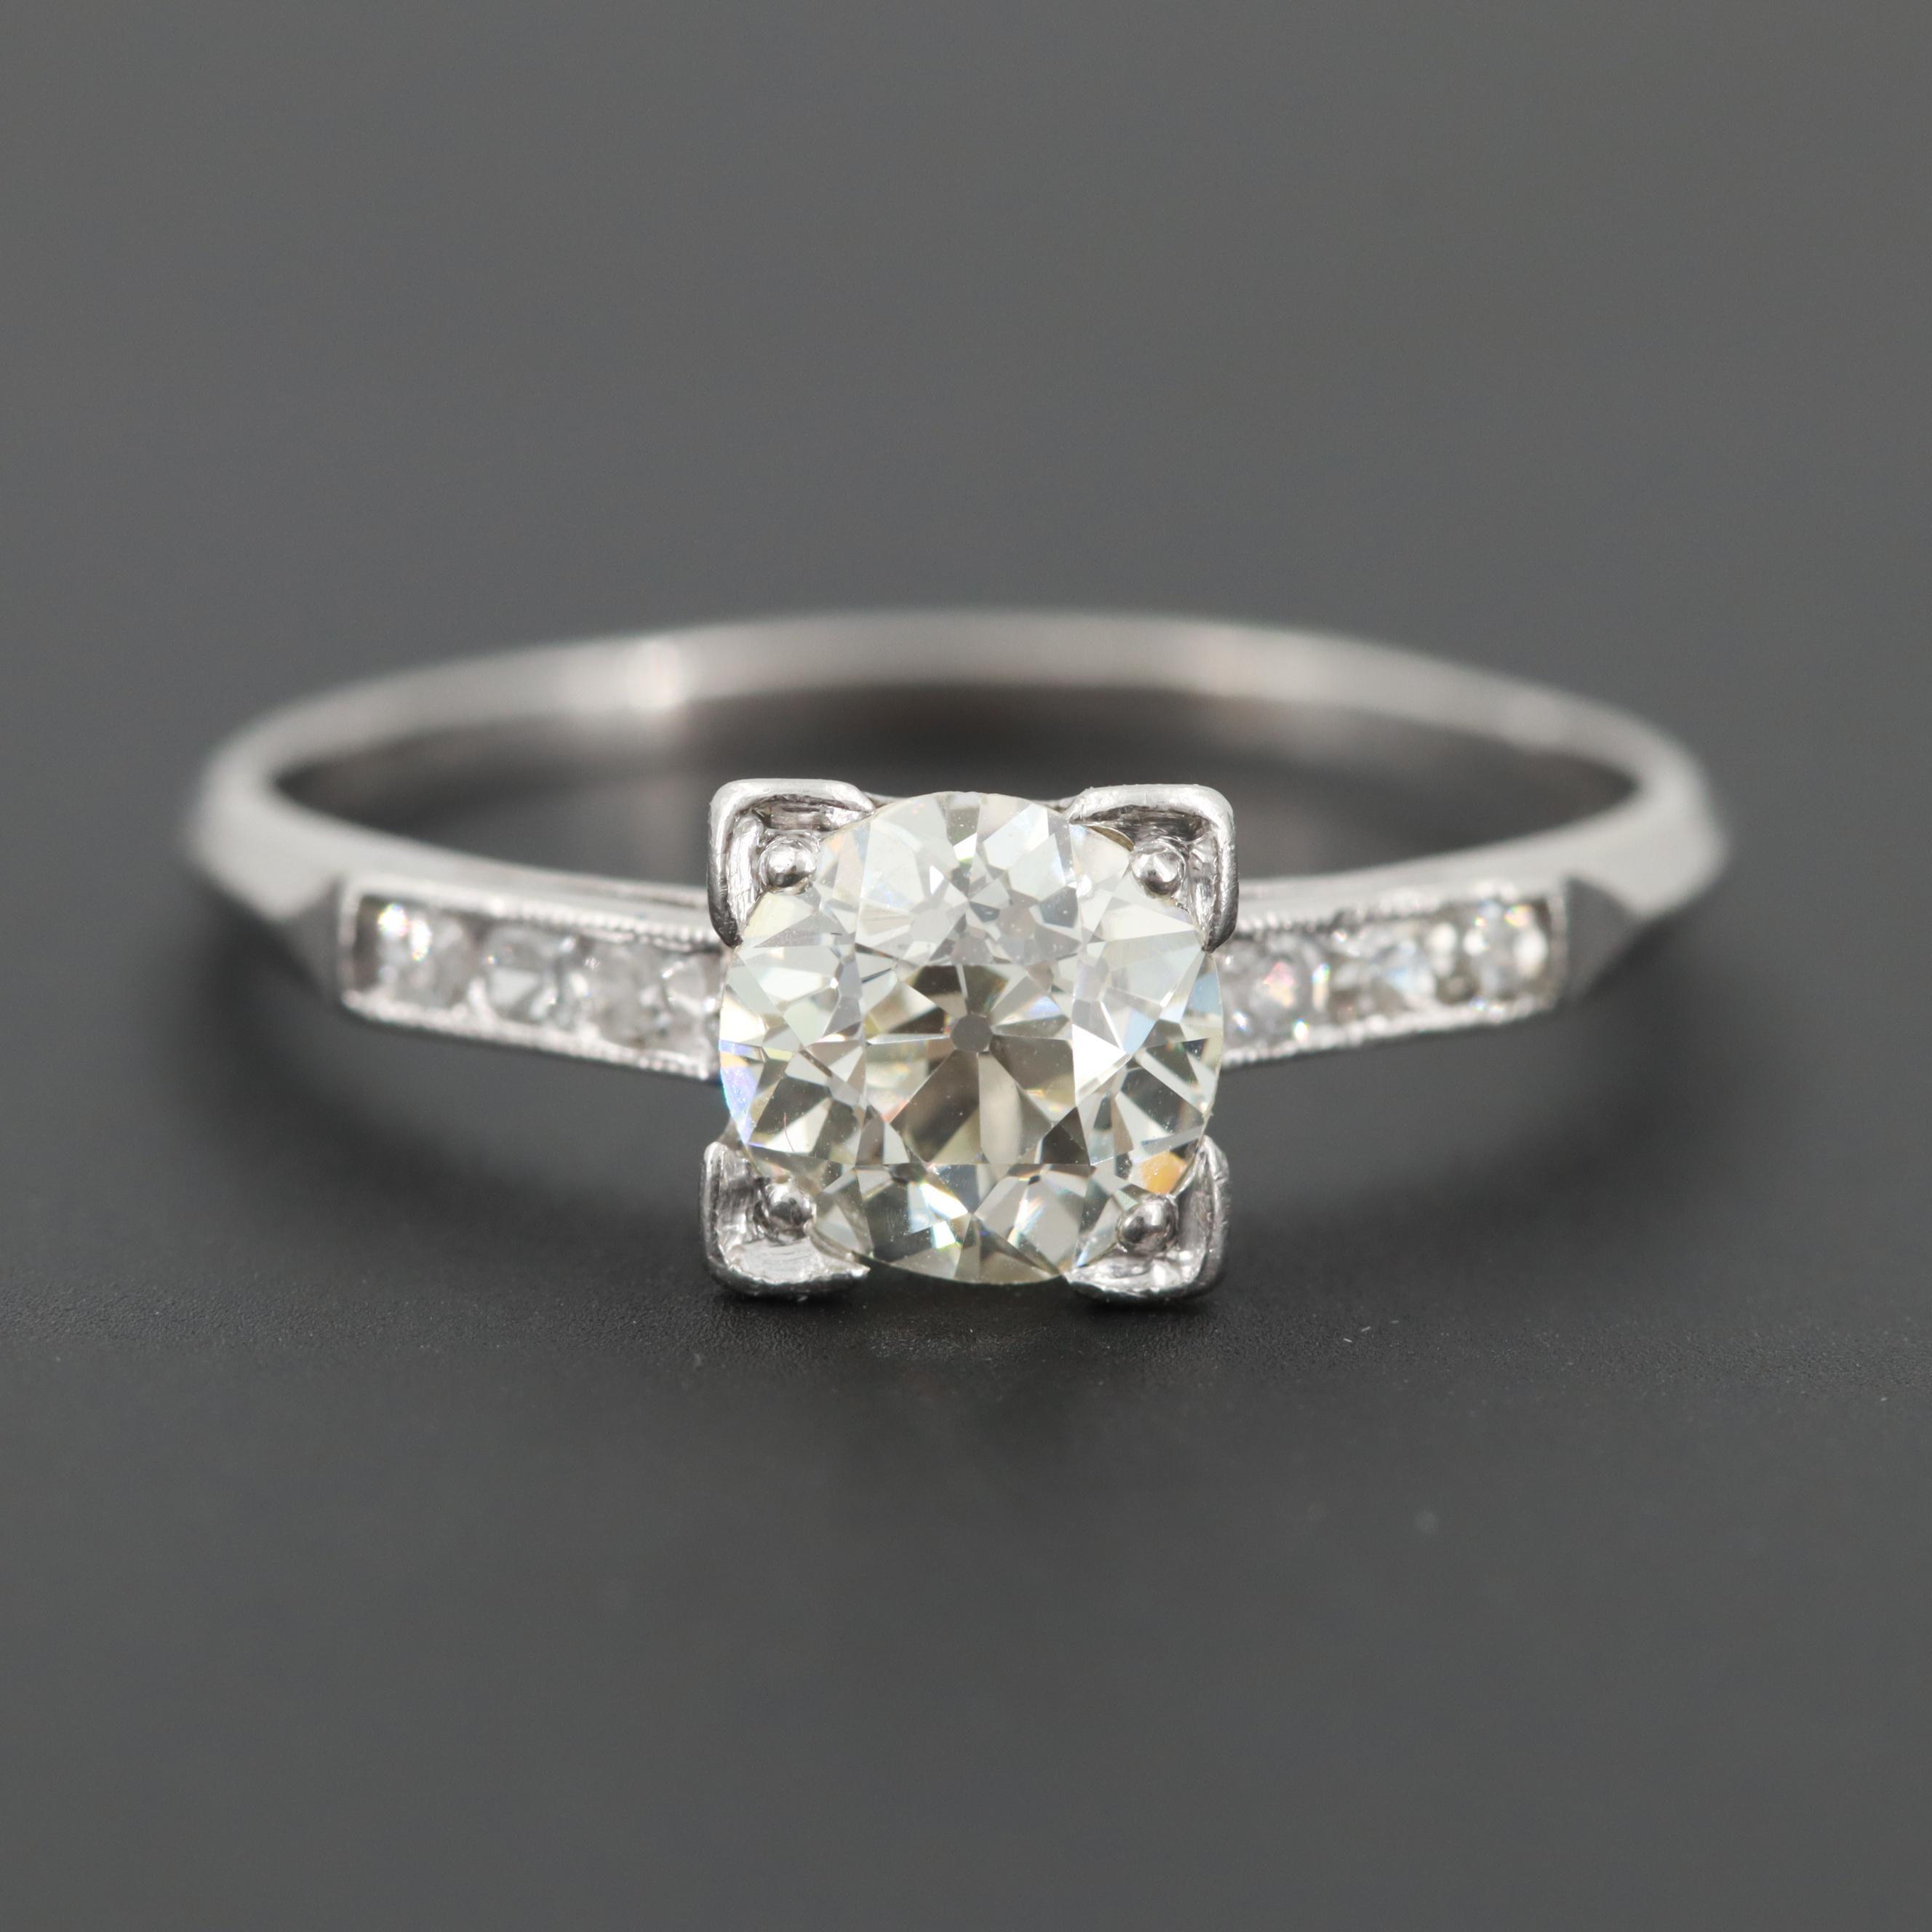 Vintage Platinum 1.07 CTW Diamond Ring